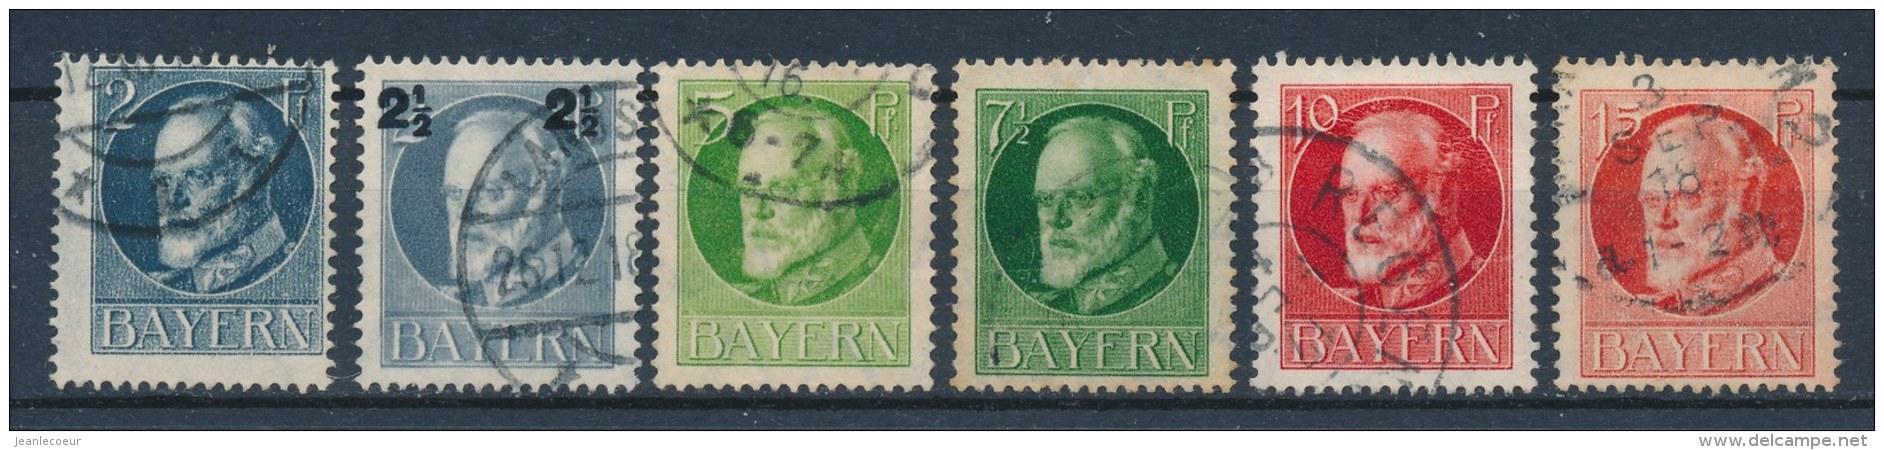 Beieren/Bavaria/Baviere/Bayern 1916 Mi: 110A-115A Yt: 110-115 (Gebr/used/obl/o)(255) - Bavière